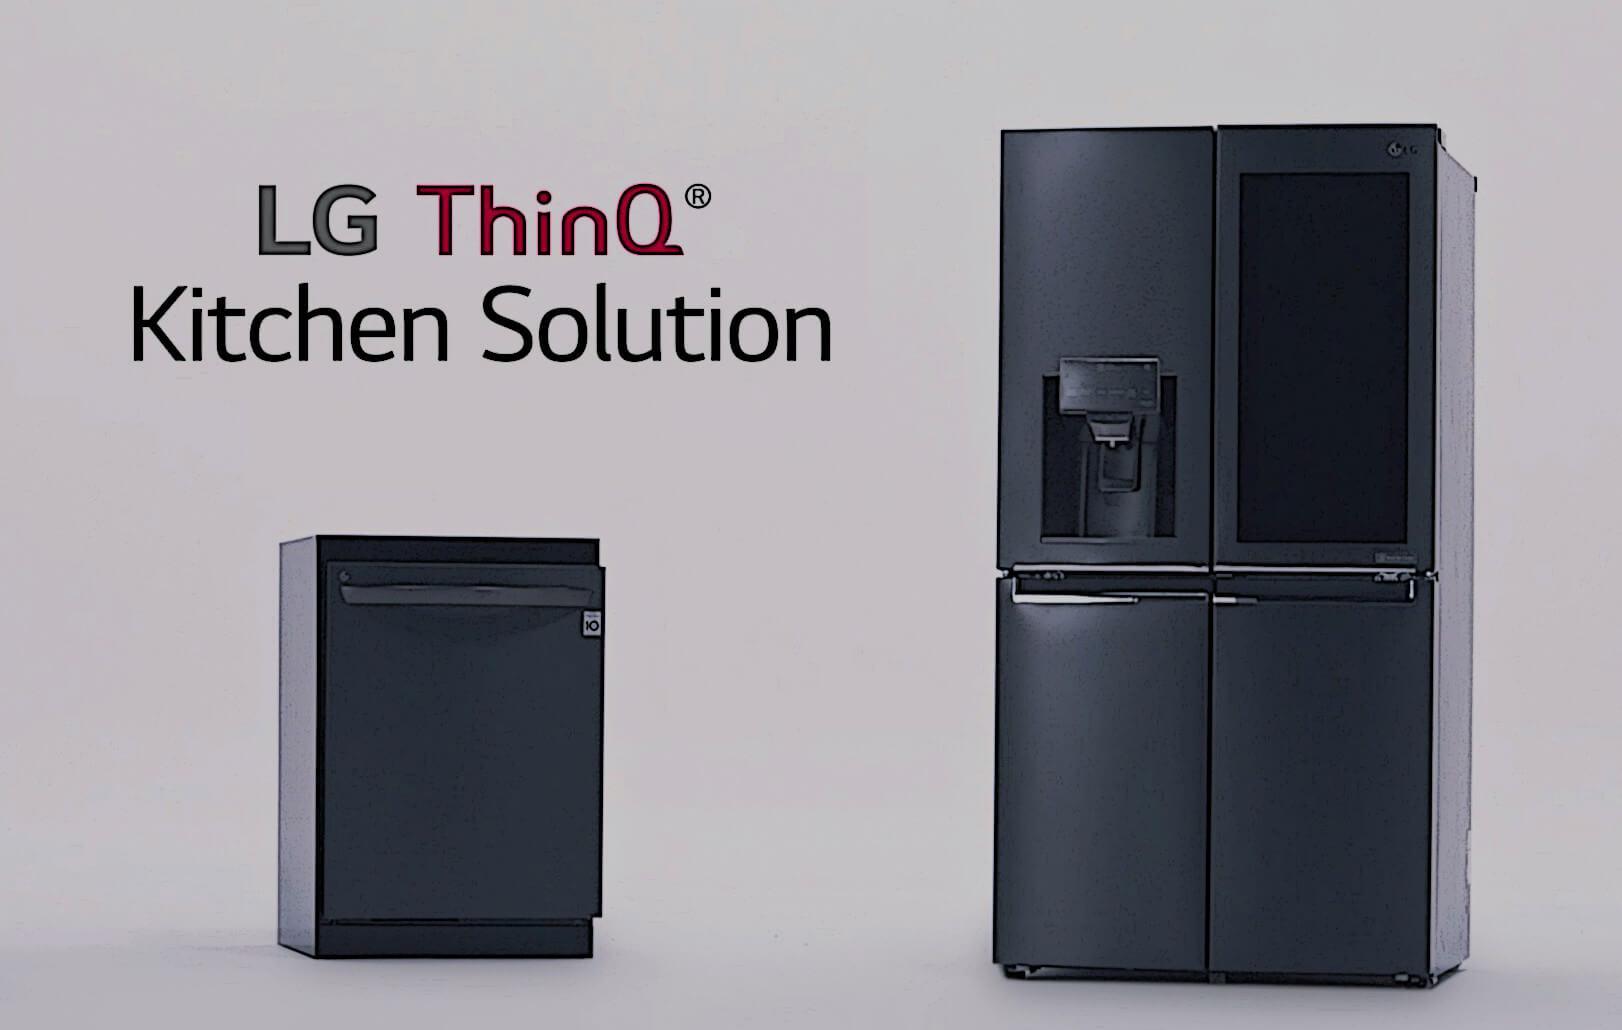 LG ThinQ Kitchen Solution Release crop - Eletrodomésticos da LG agora suportam Amazon Alexa e Google Assistente